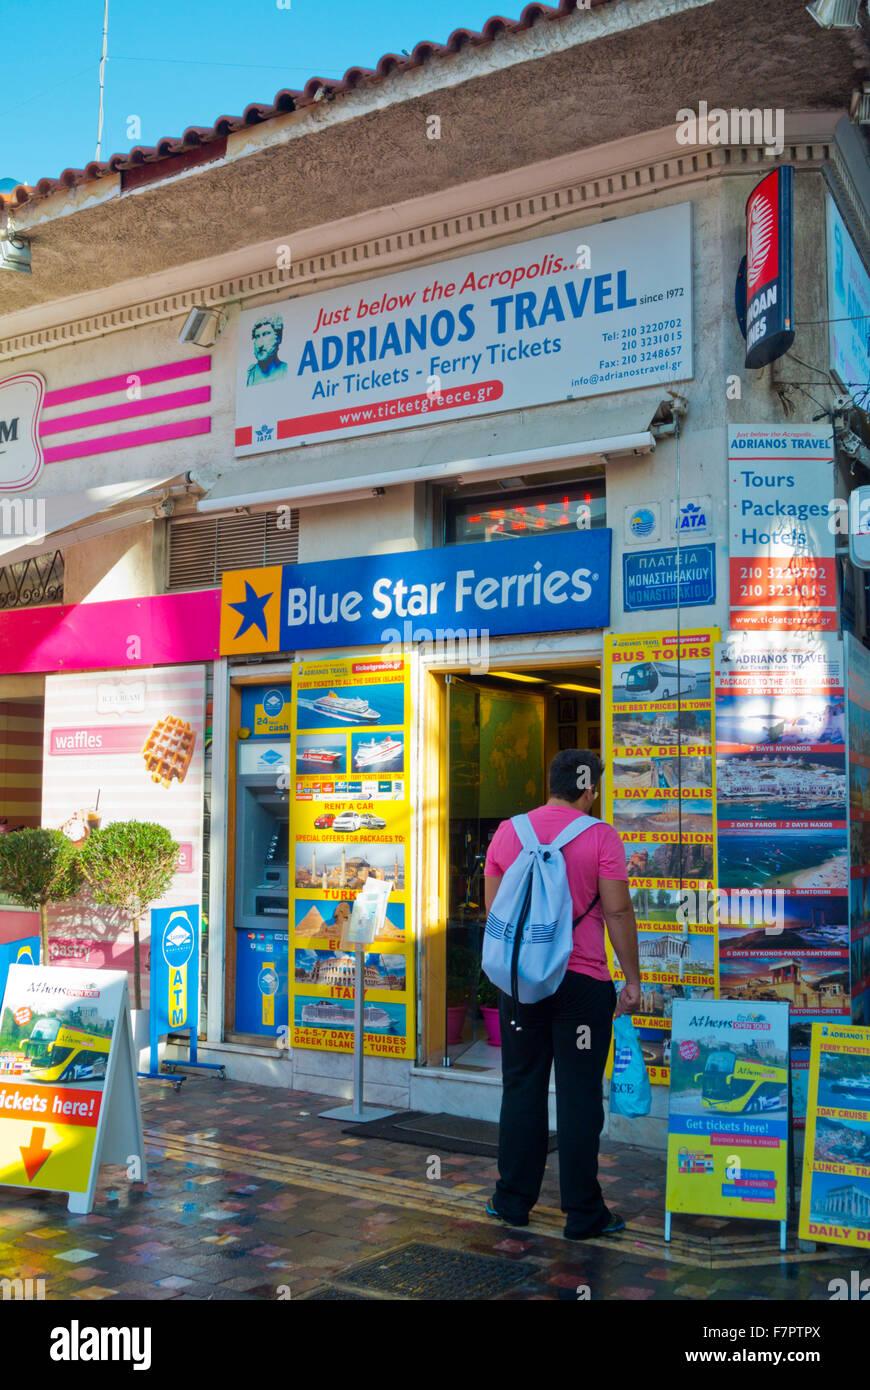 Adrianos Travel, travel agency popular among tourists, Monastiraki square, Athens, Greece - Stock Image